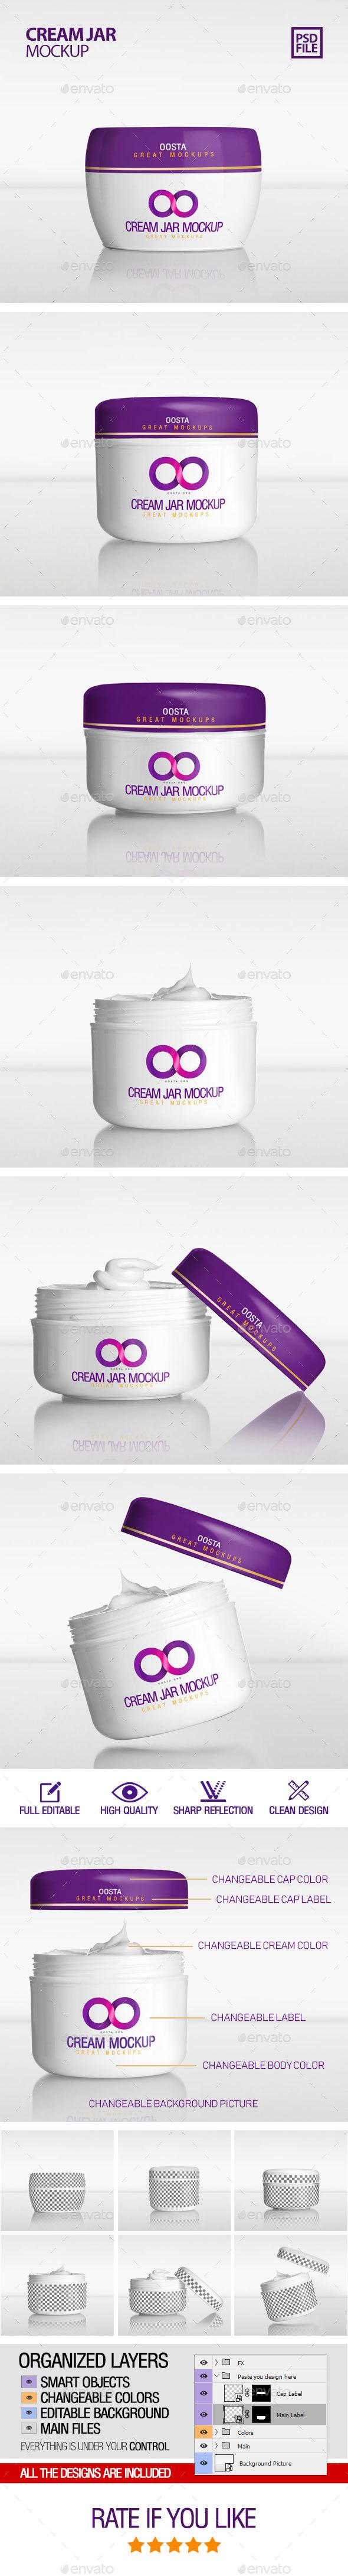 Cream Jar Mockup - Product Mock-Ups Graphics